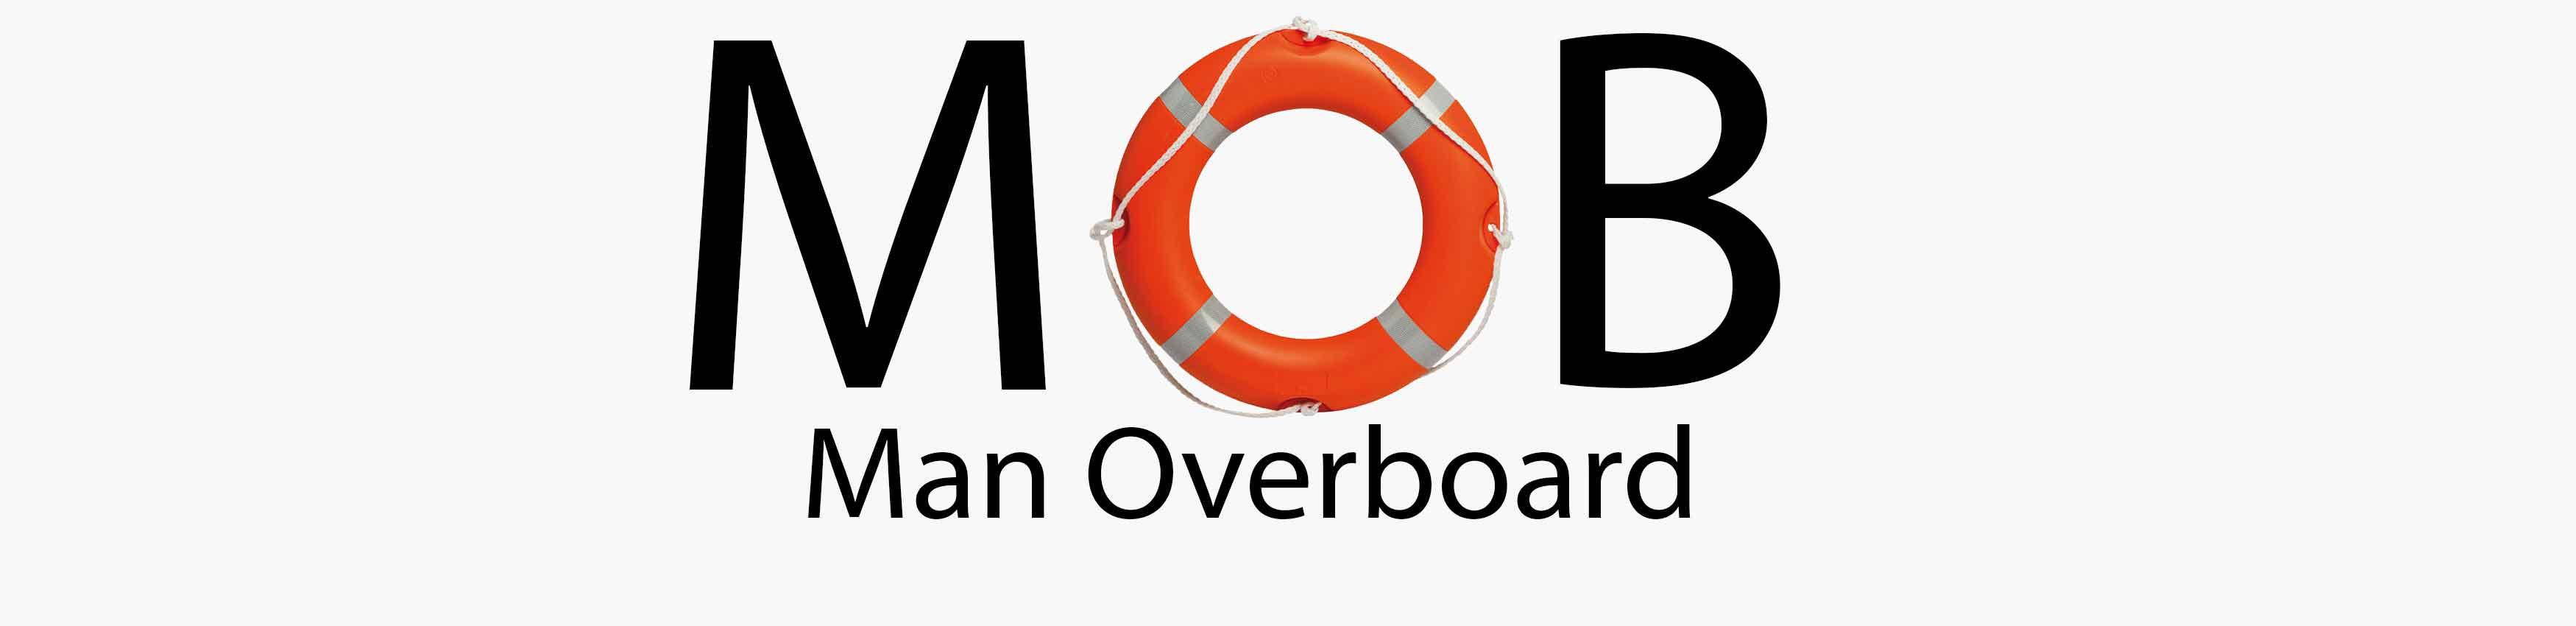 Mob - Man Over Board